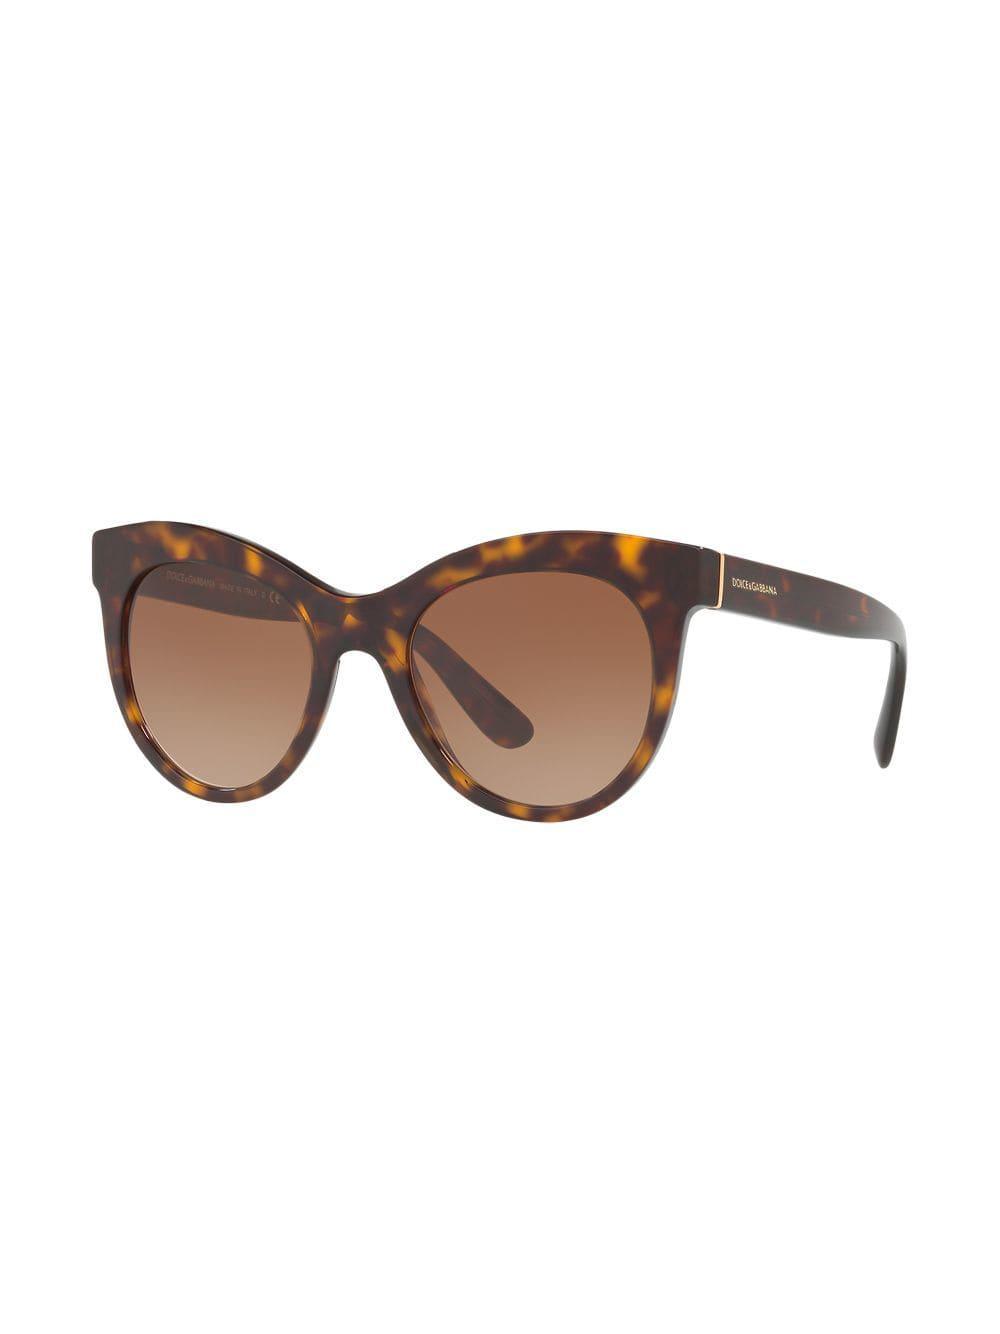 626cbae8e5d Dolce   Gabbana - Brown Round Sunglasses - Lyst. View fullscreen